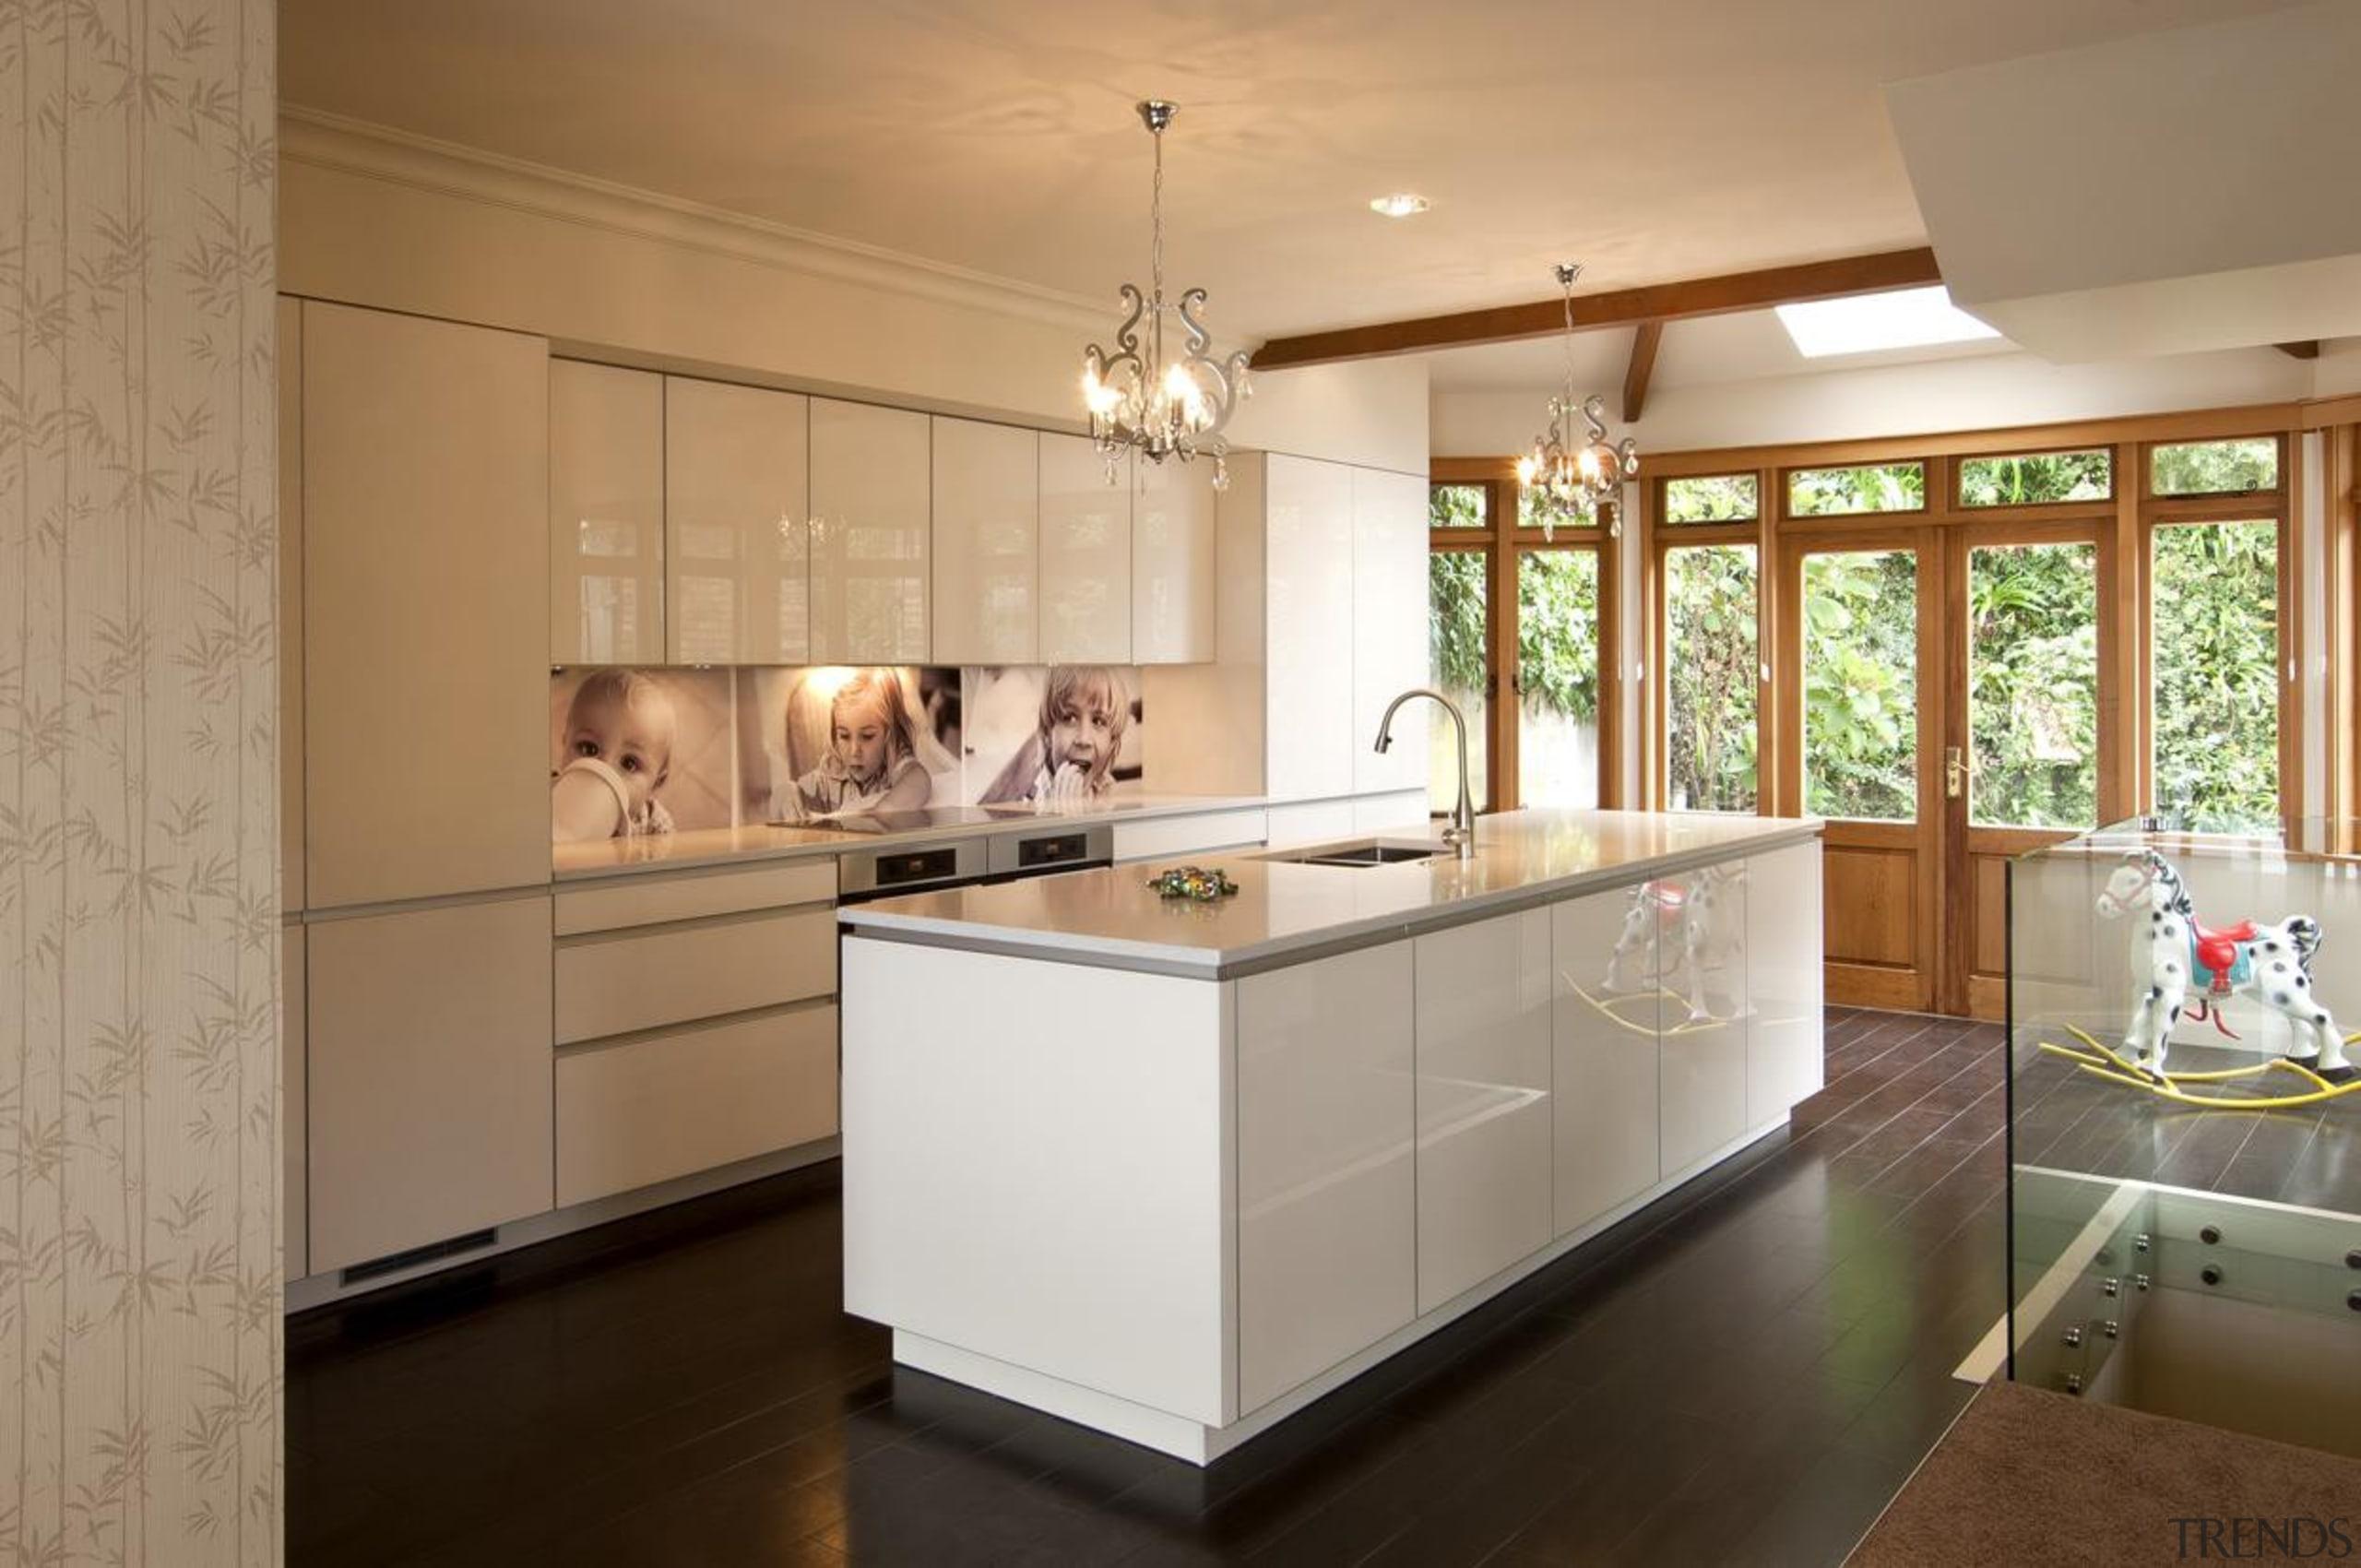 Hataitai Kitchen - Hataitai Kitchen - cabinetry   cabinetry, countertop, cuisine classique, interior design, kitchen, real estate, room, brown